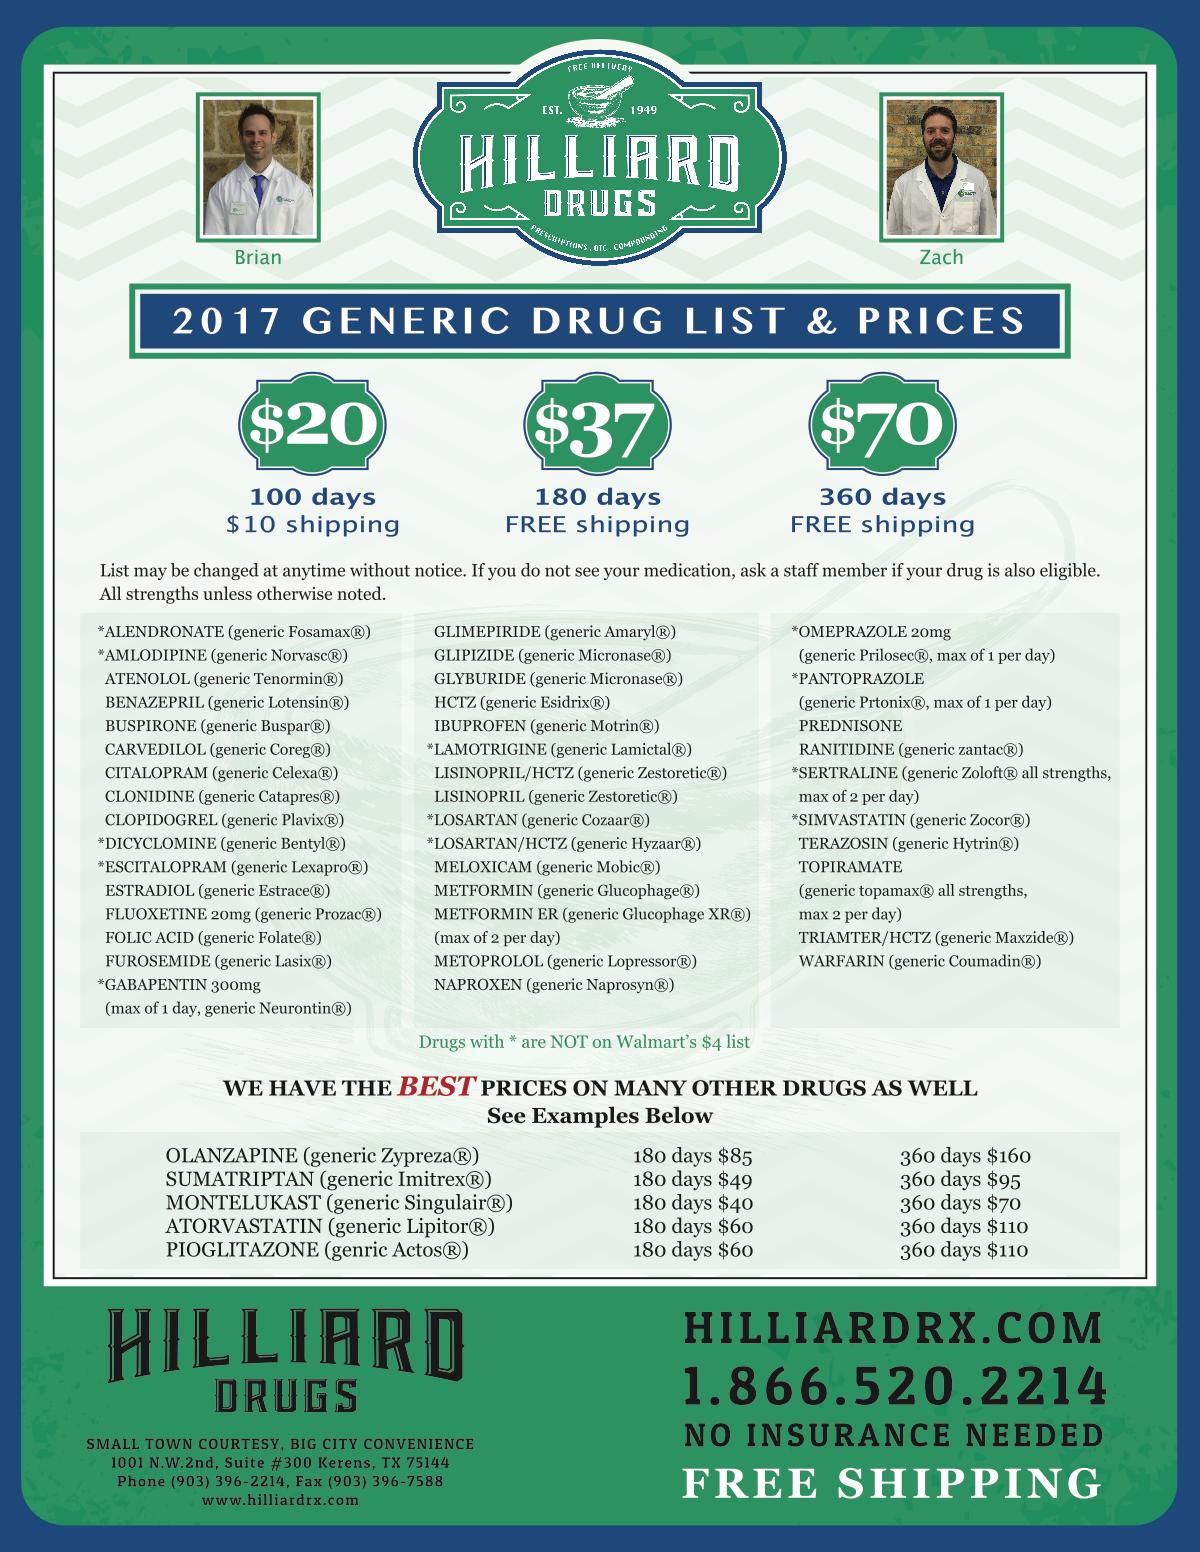 2017 Hilliard Drug Extended Day Supply Generic Drug List